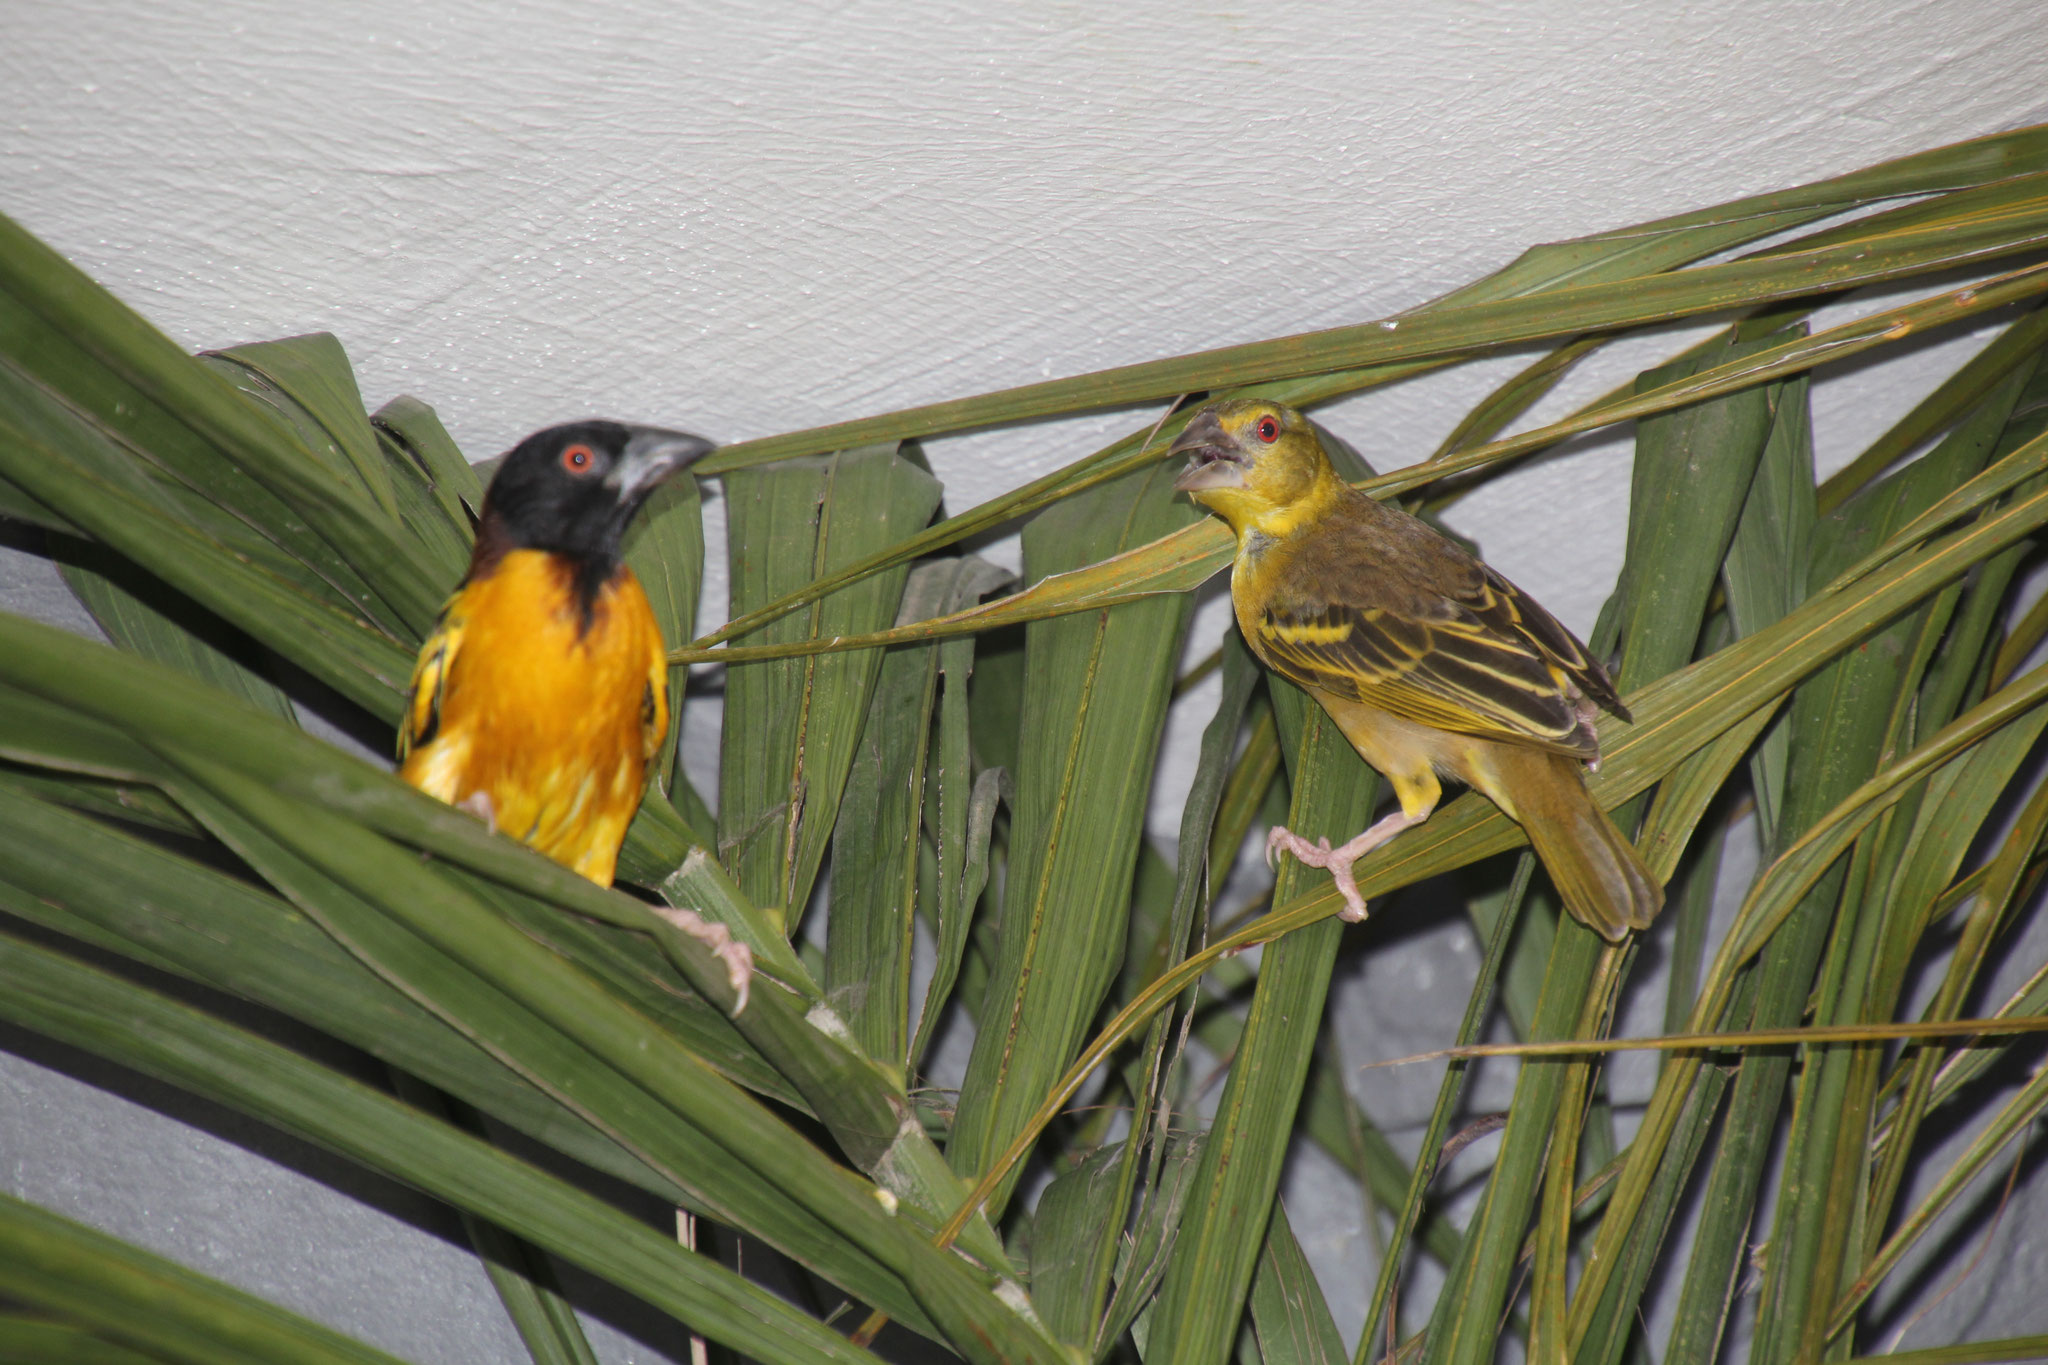 Webervögel nisten gerne in den Palmen.